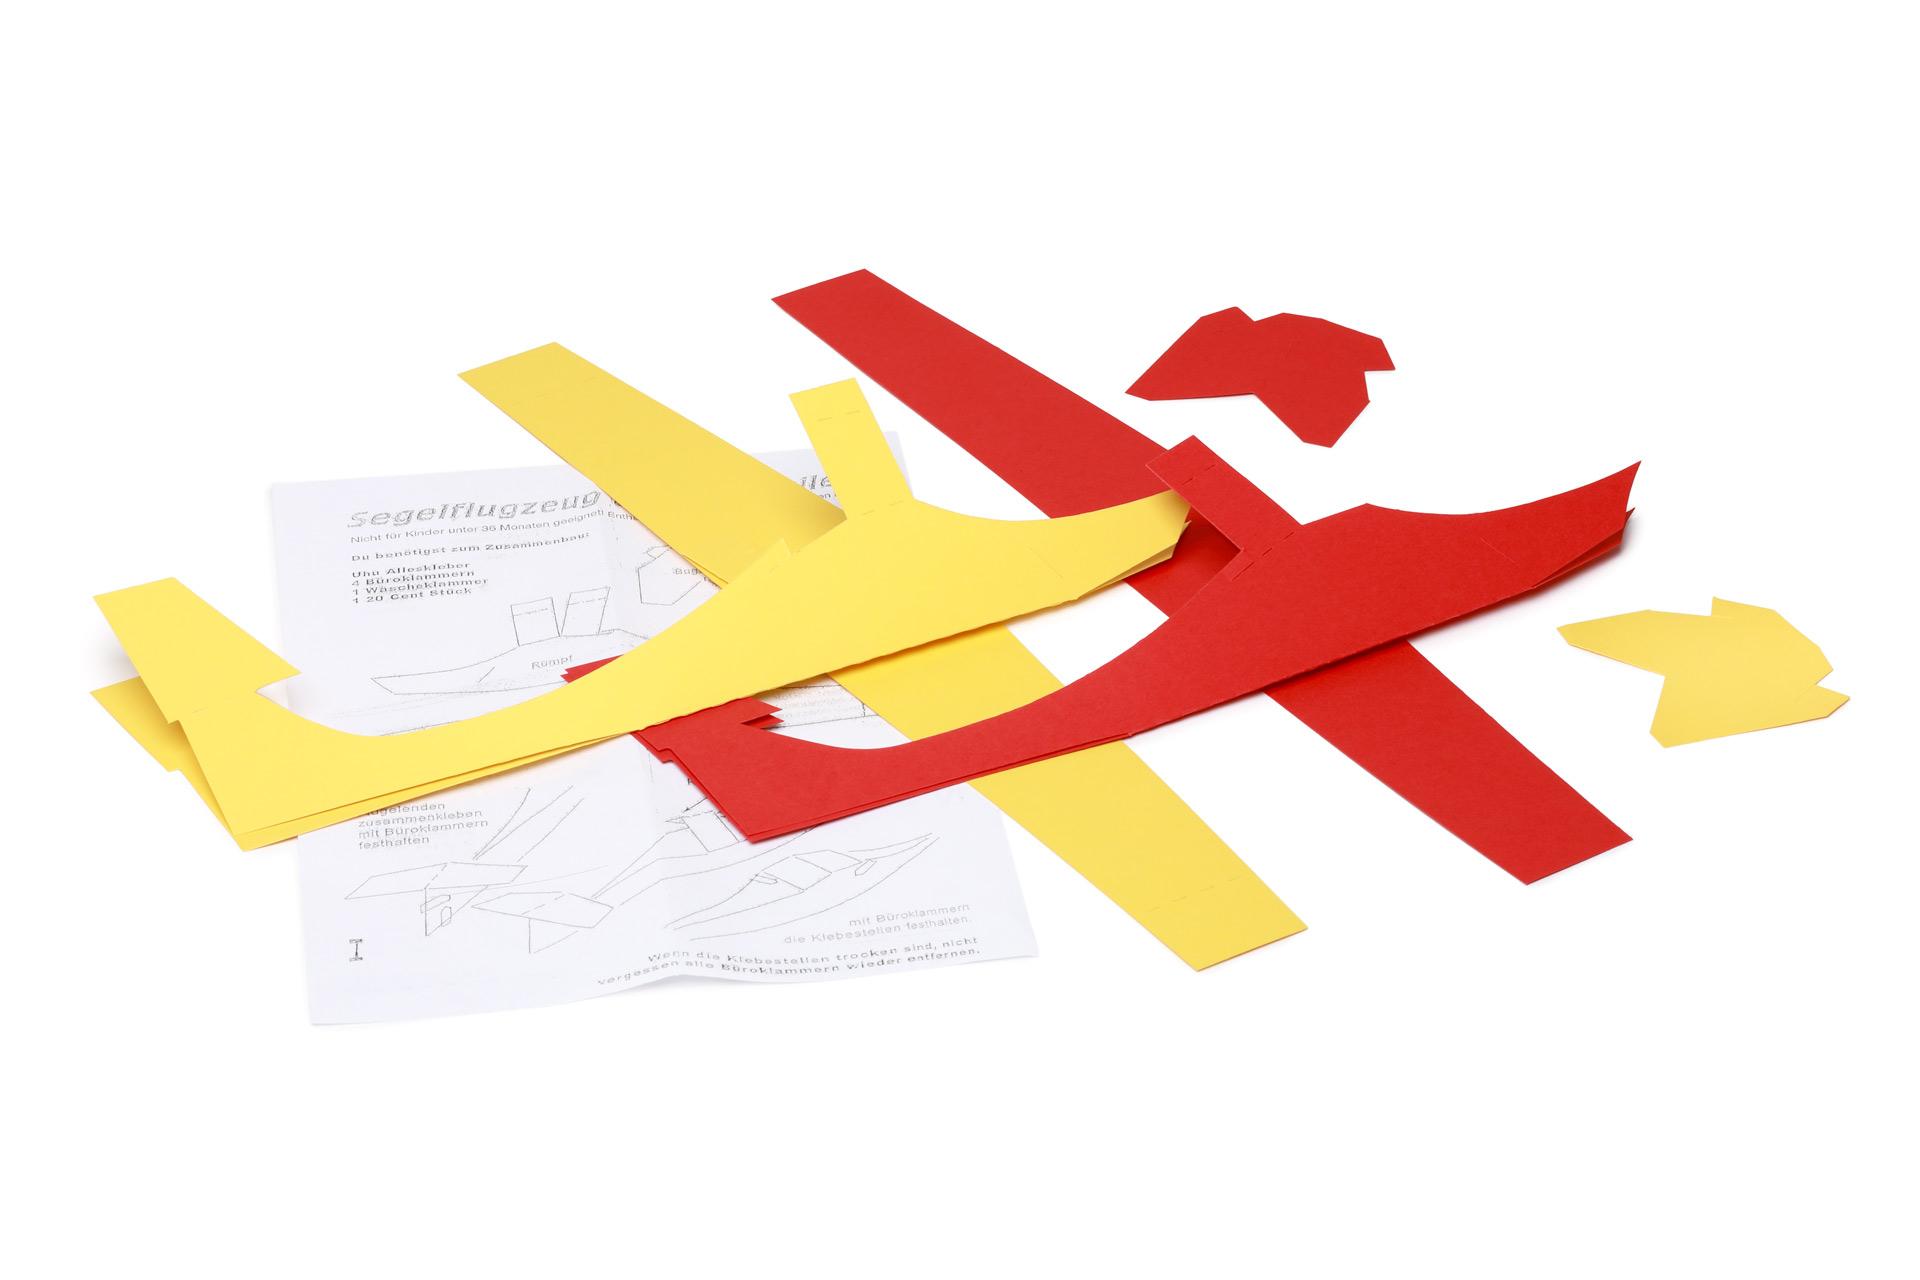 Segelflugsatz-Bausatz-ohneVerpackung-ksg